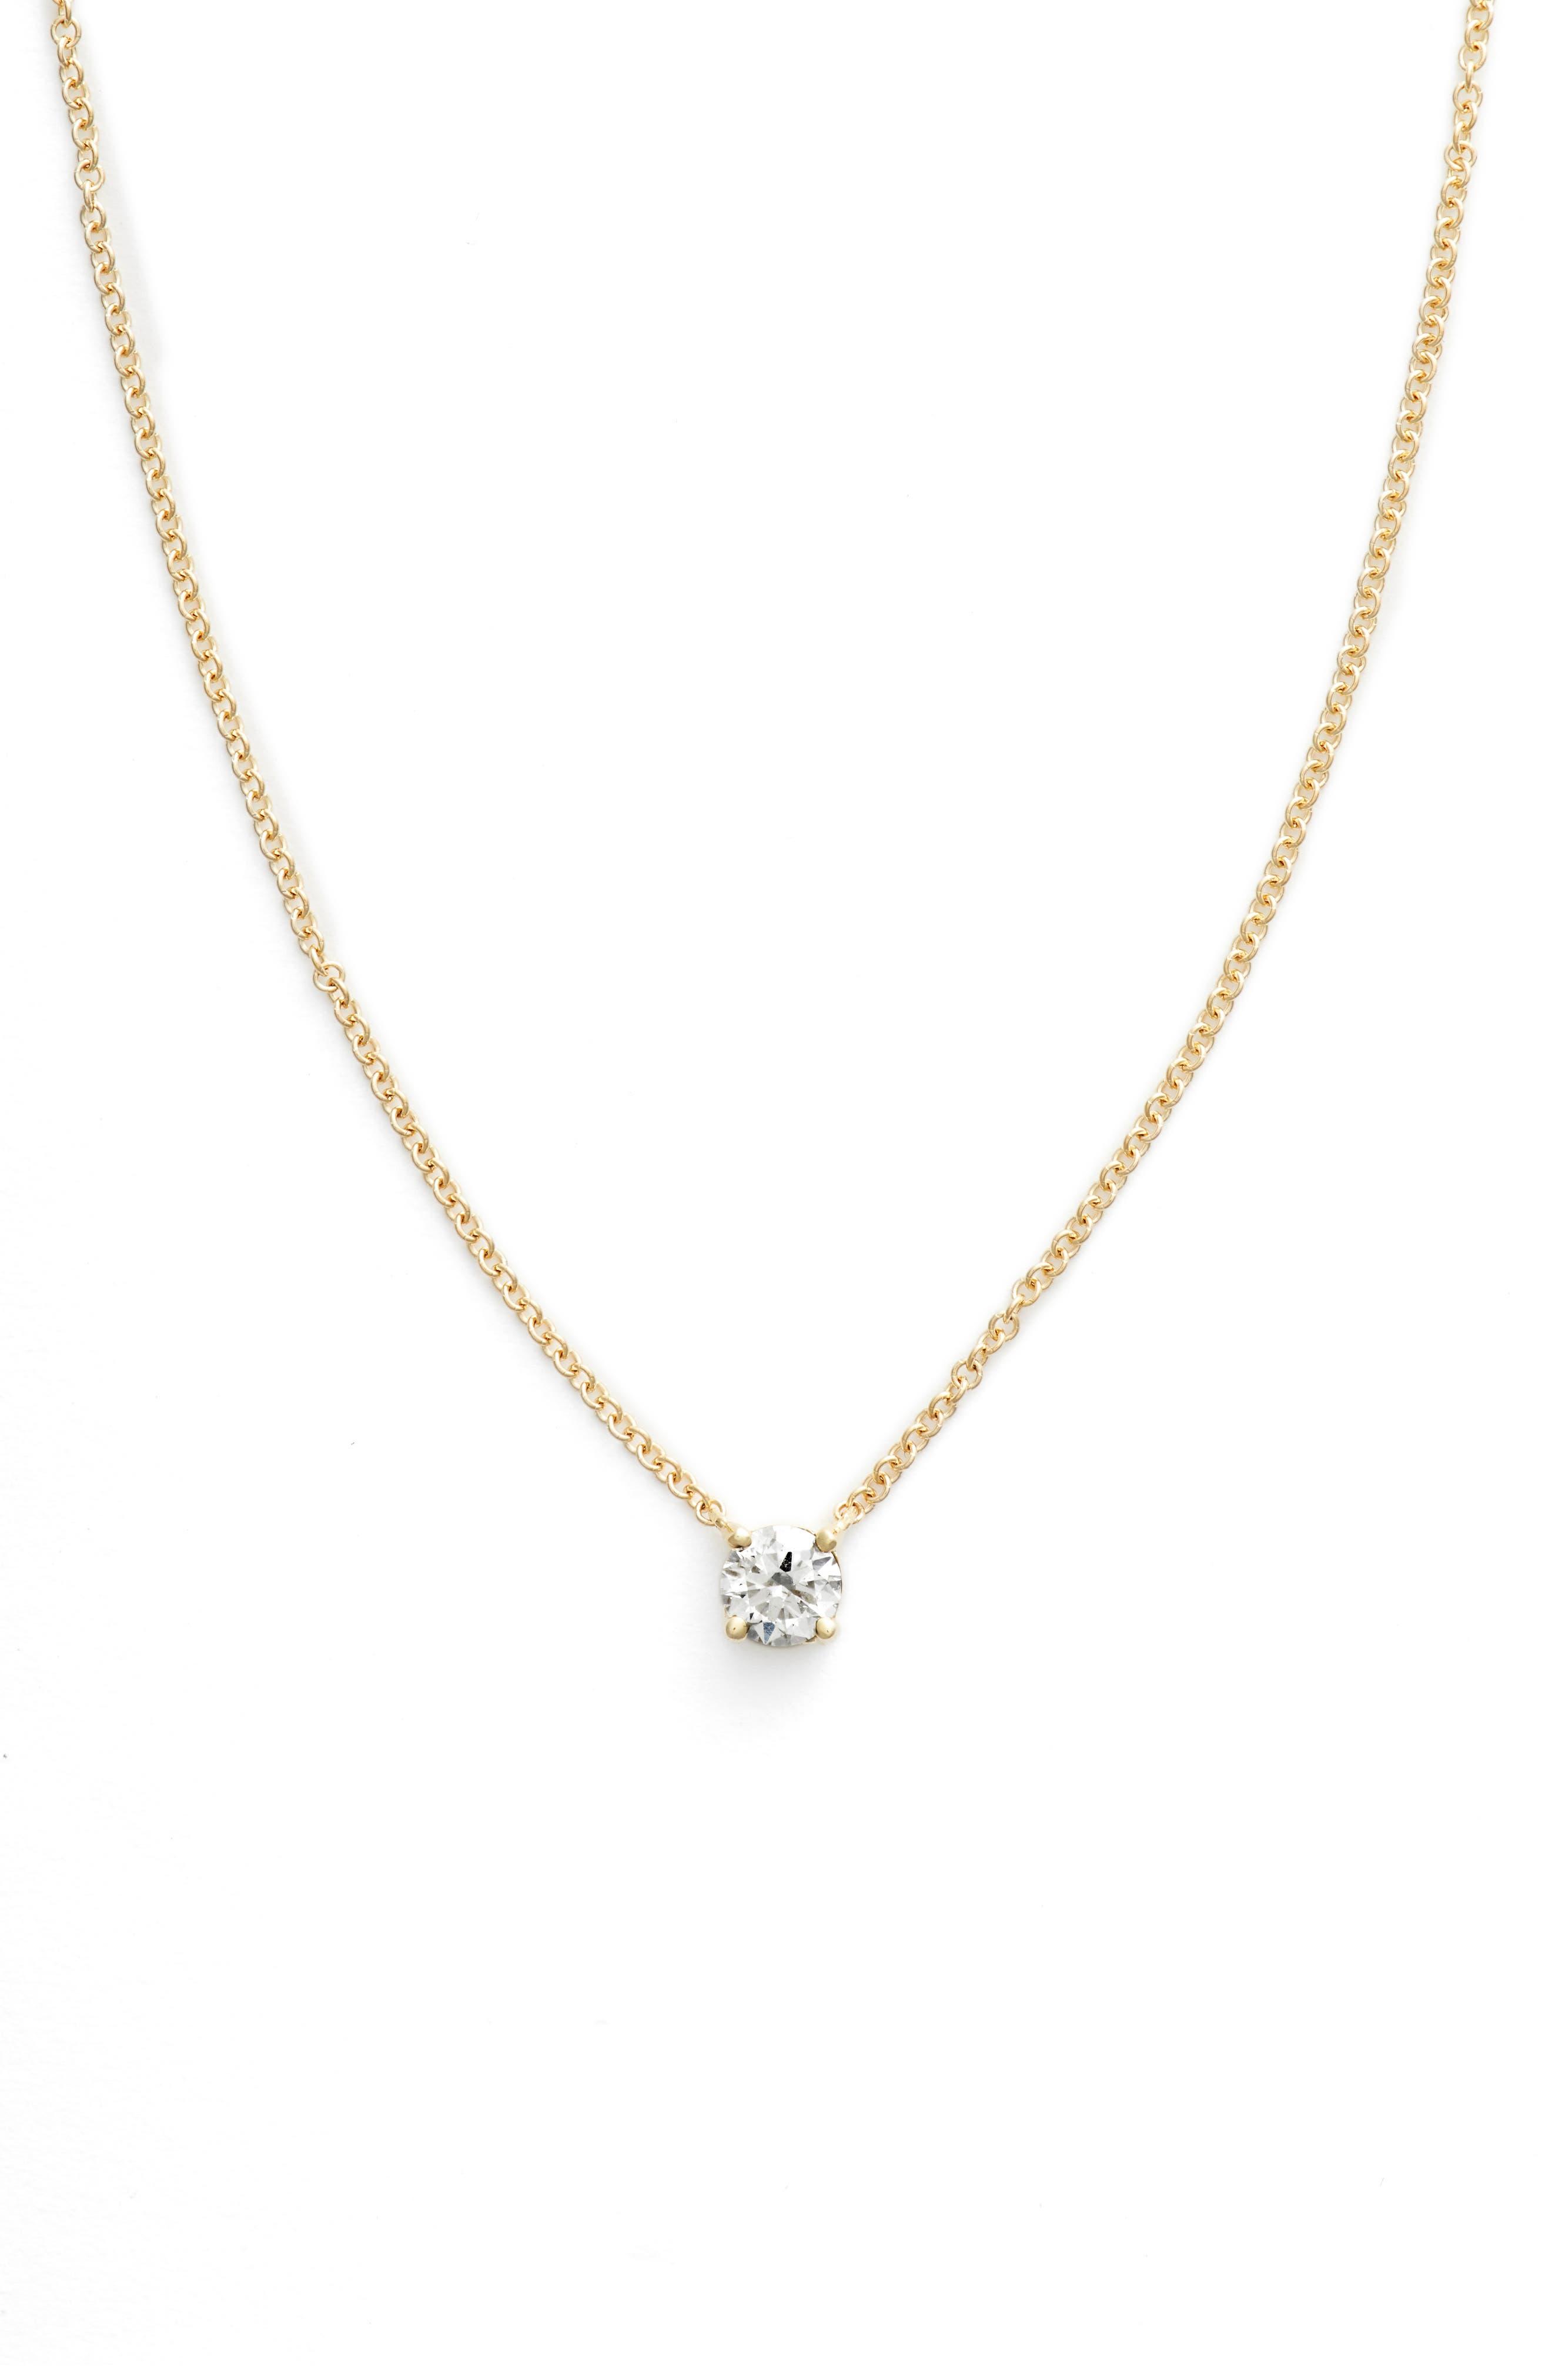 Liora Solitaire Diamond Pendant Necklace,                         Main,                         color, Yellow Gold